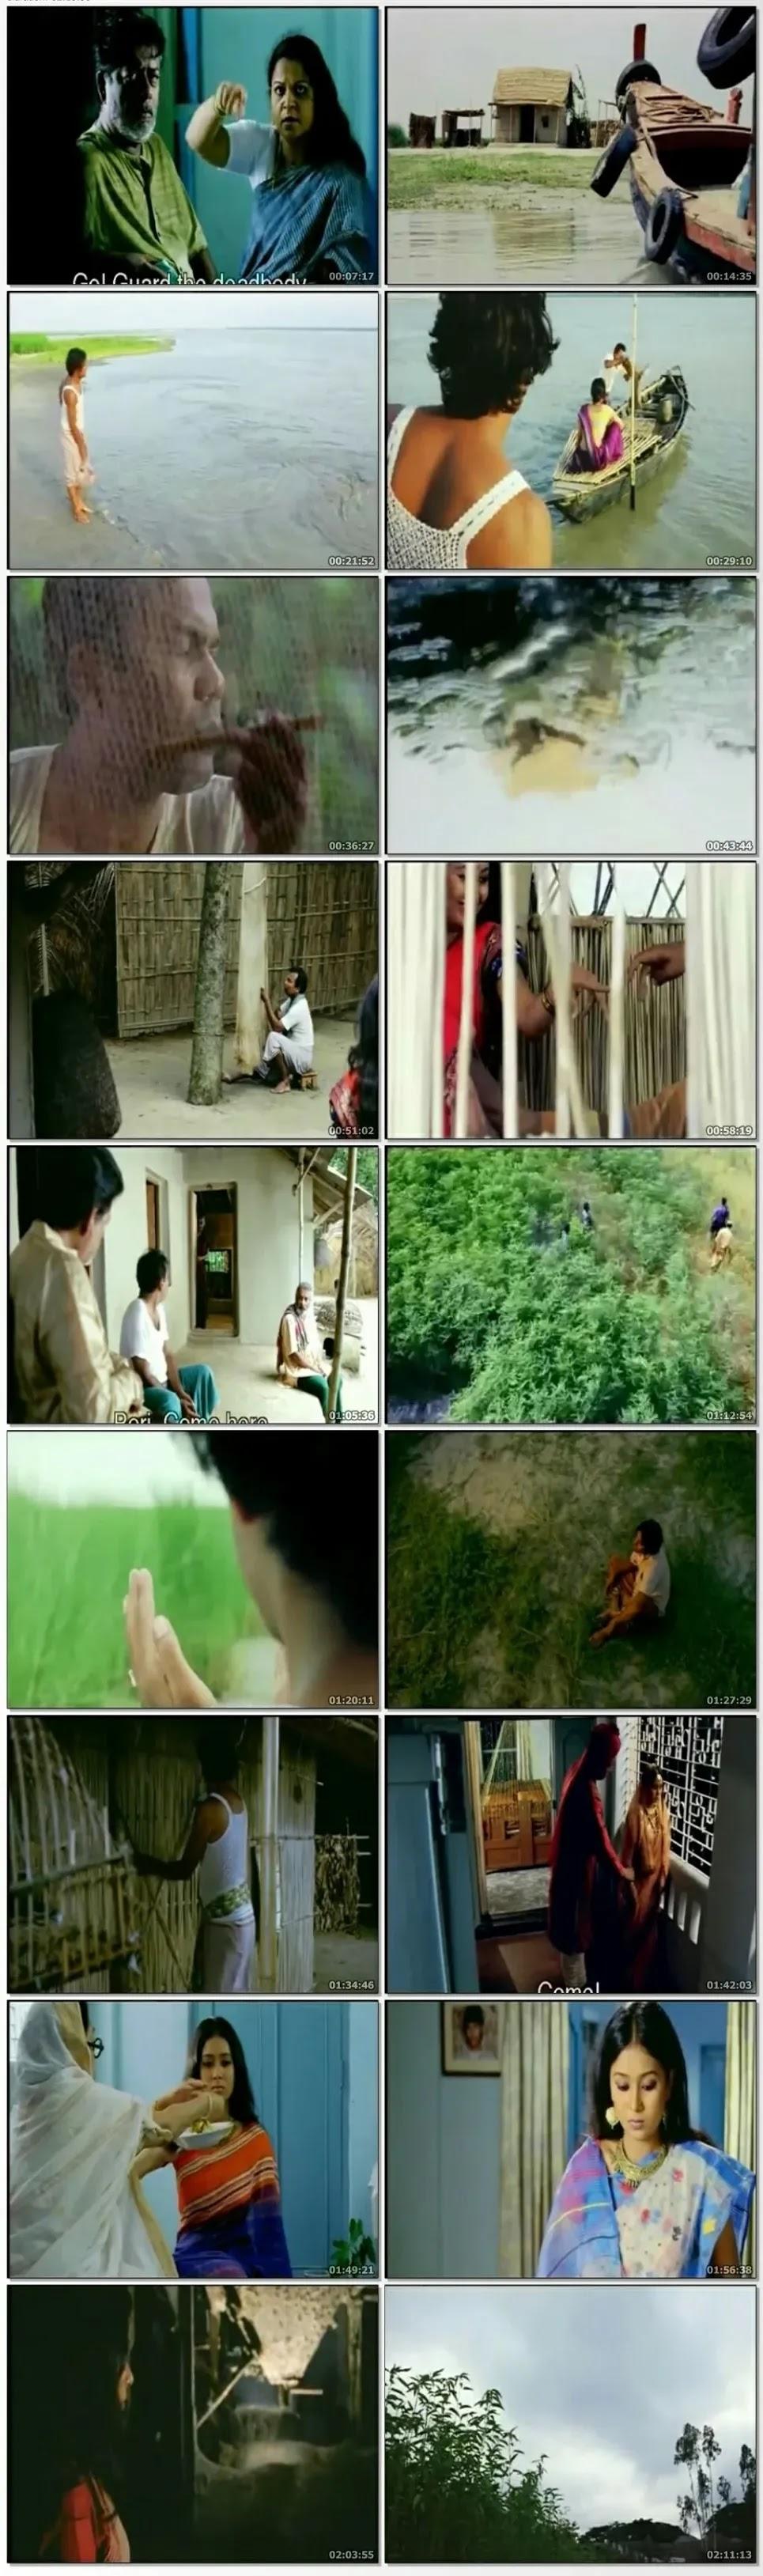 Monpura (2009) Bangla movie download